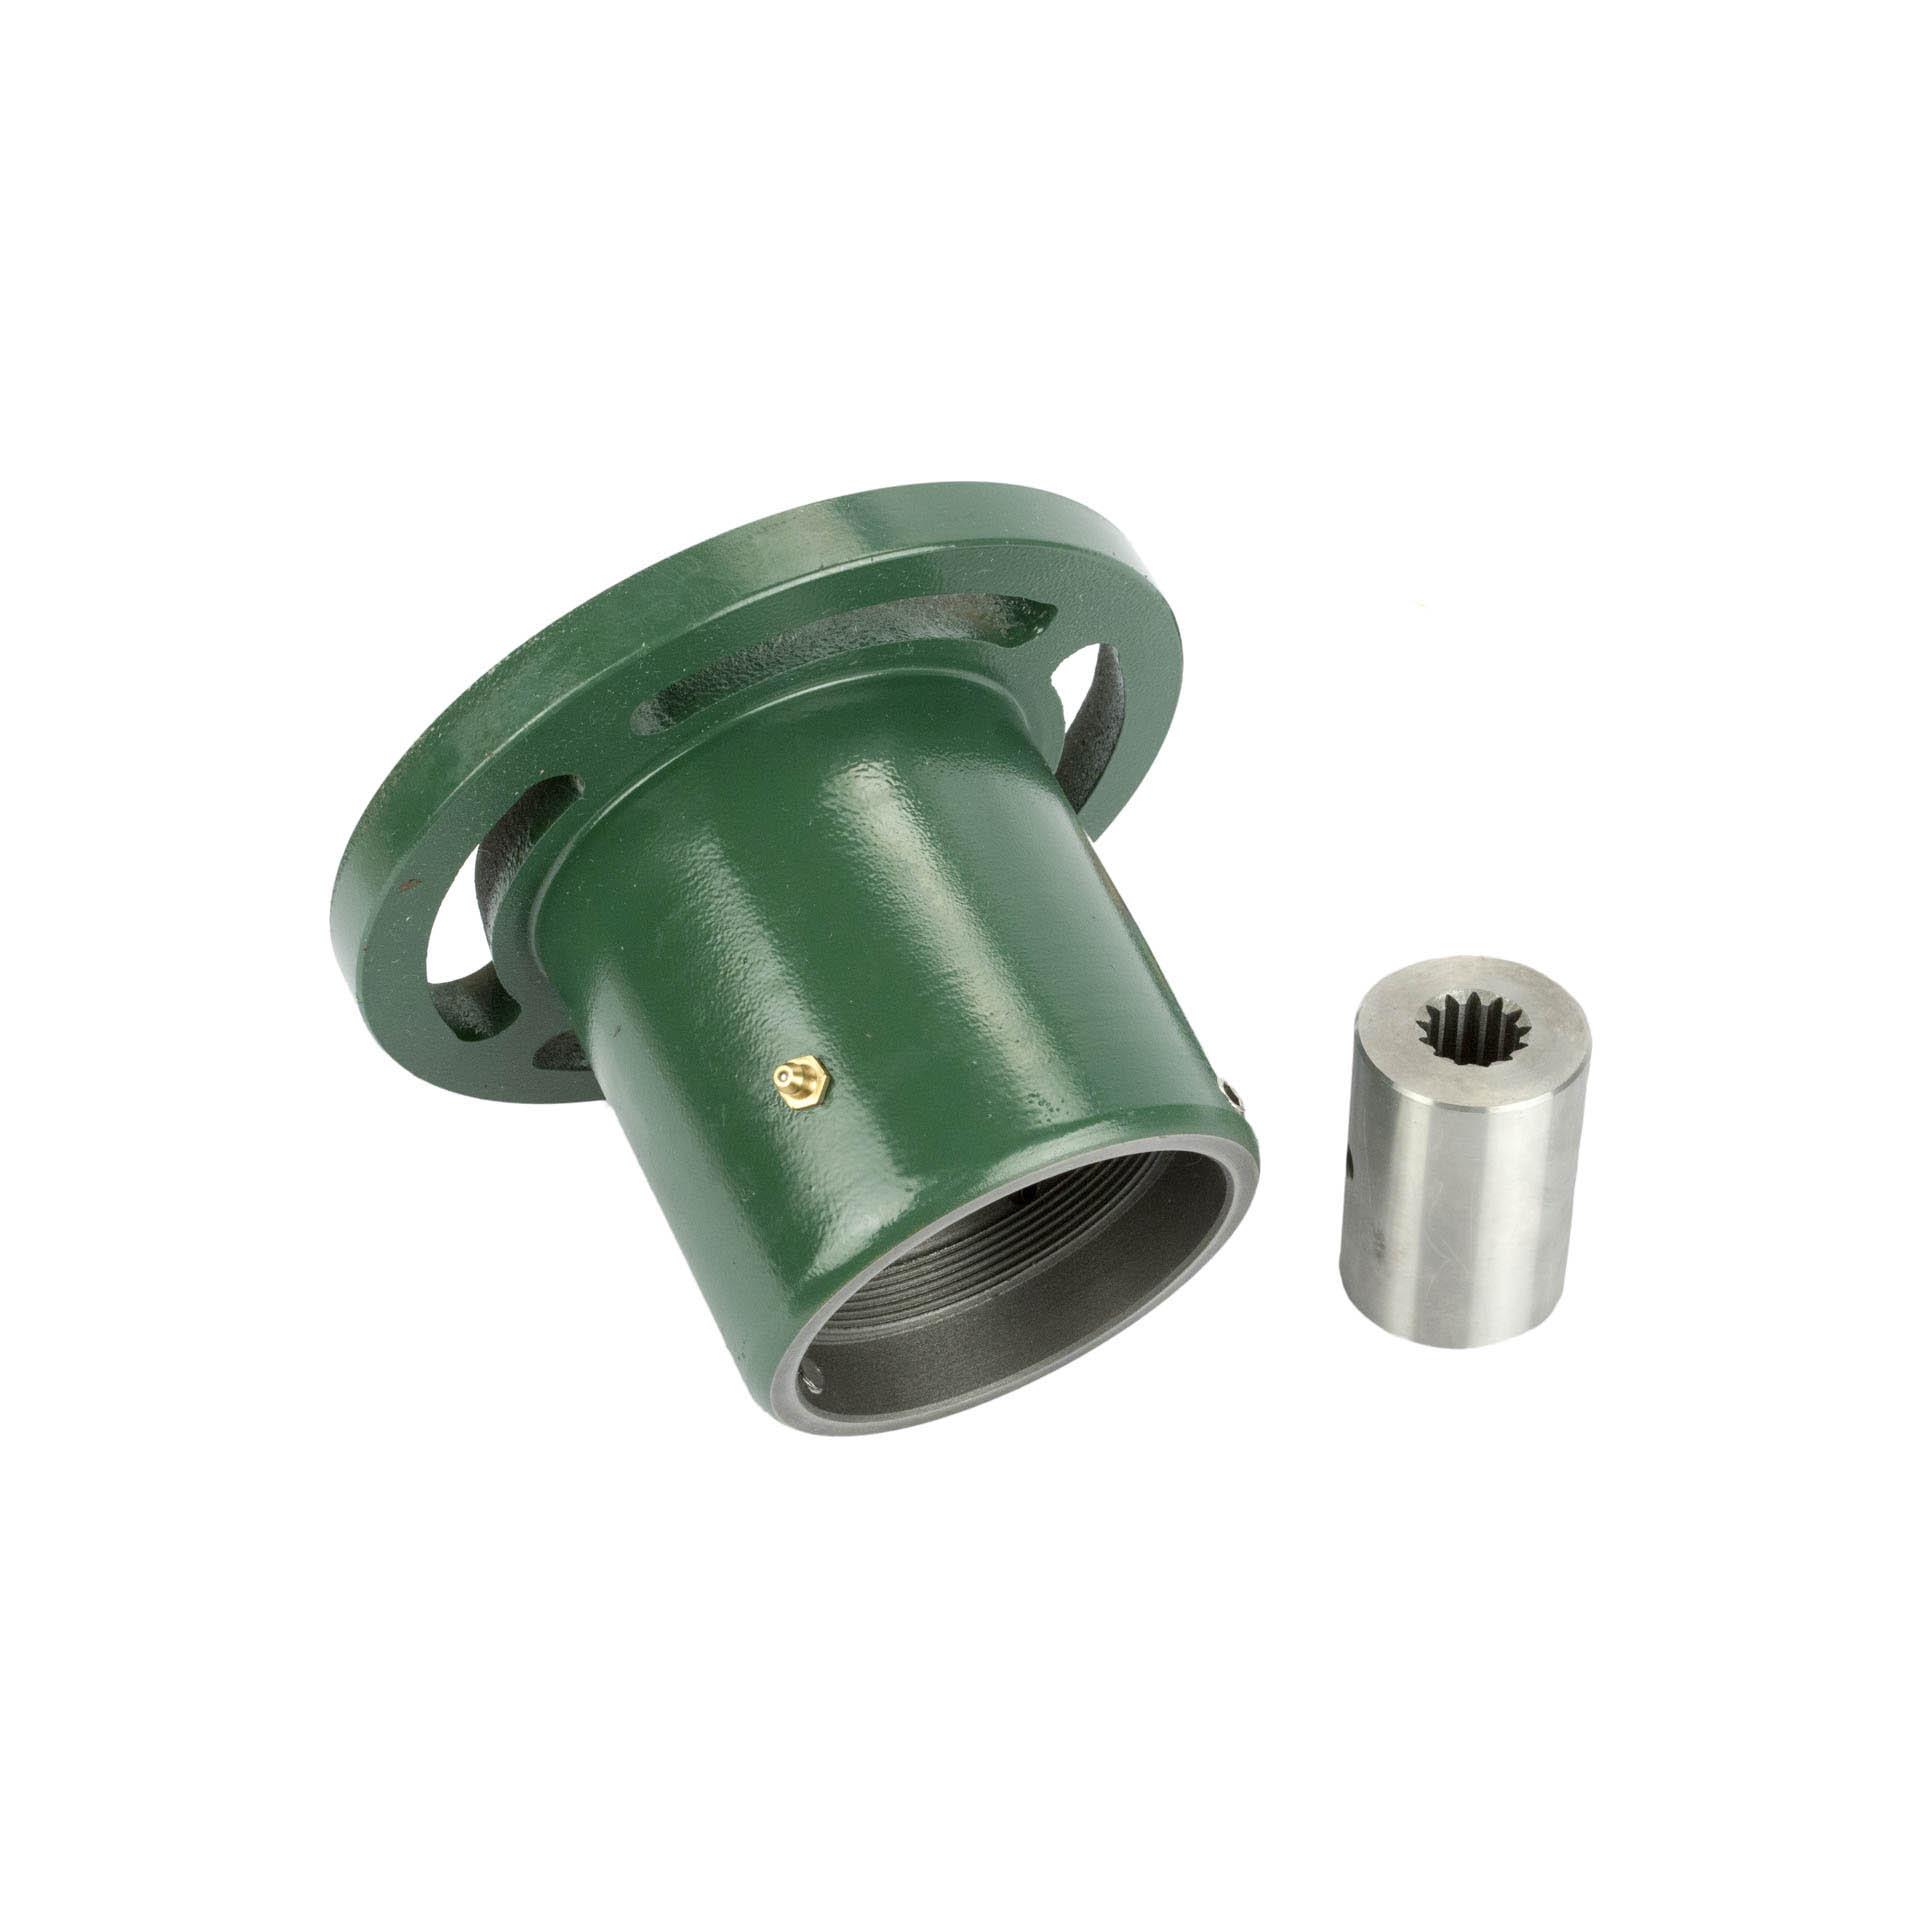 Buy hydraulic pump adaptor b3z online at access truck parts for Hydraulic pump motor adapter